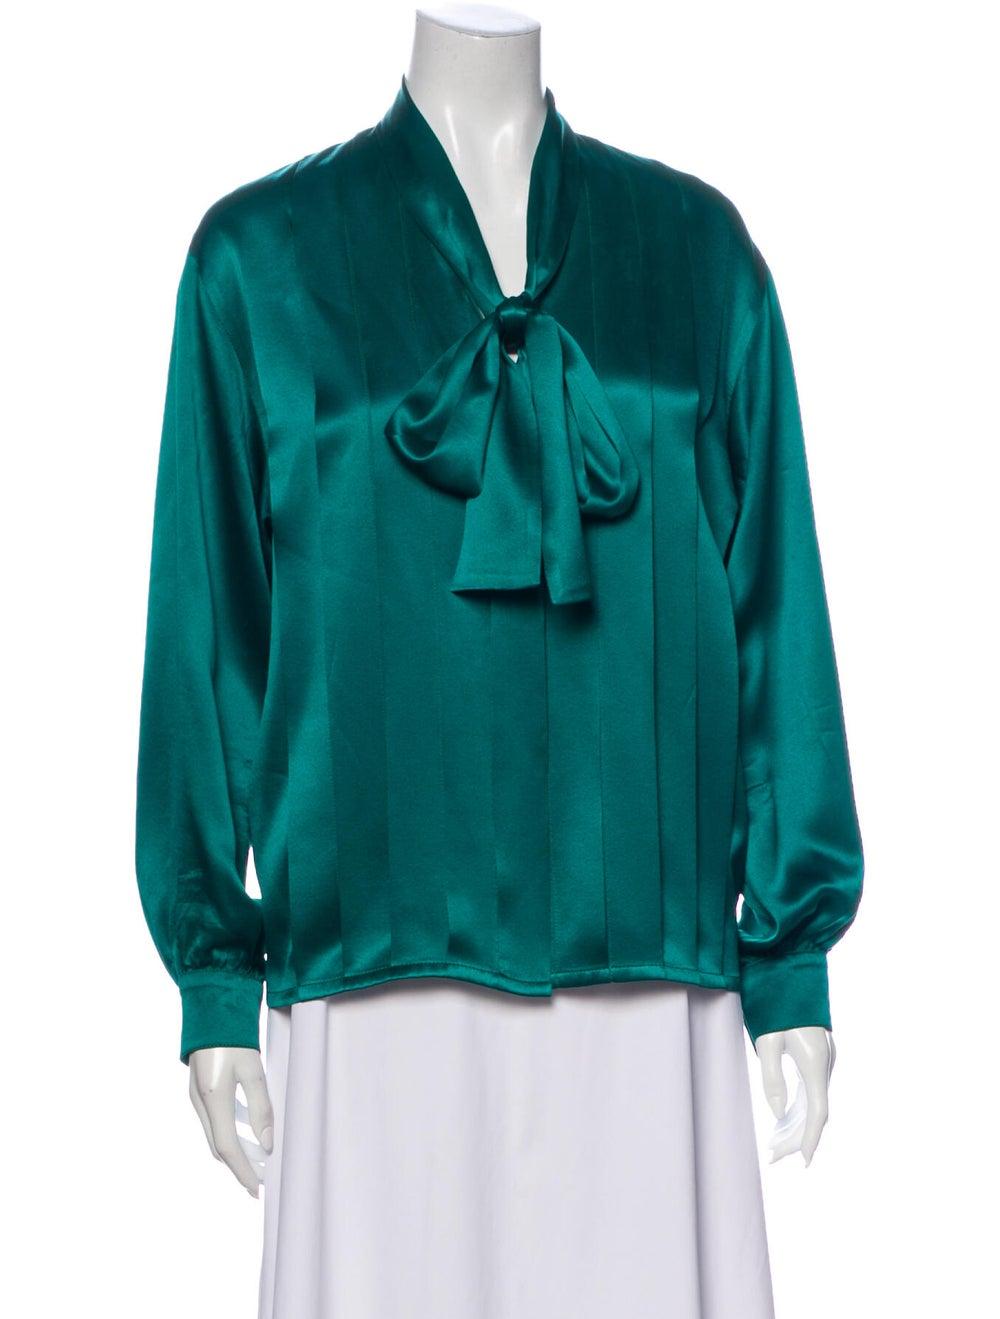 Christian Dior Vintage Silk Blouse Green - image 1